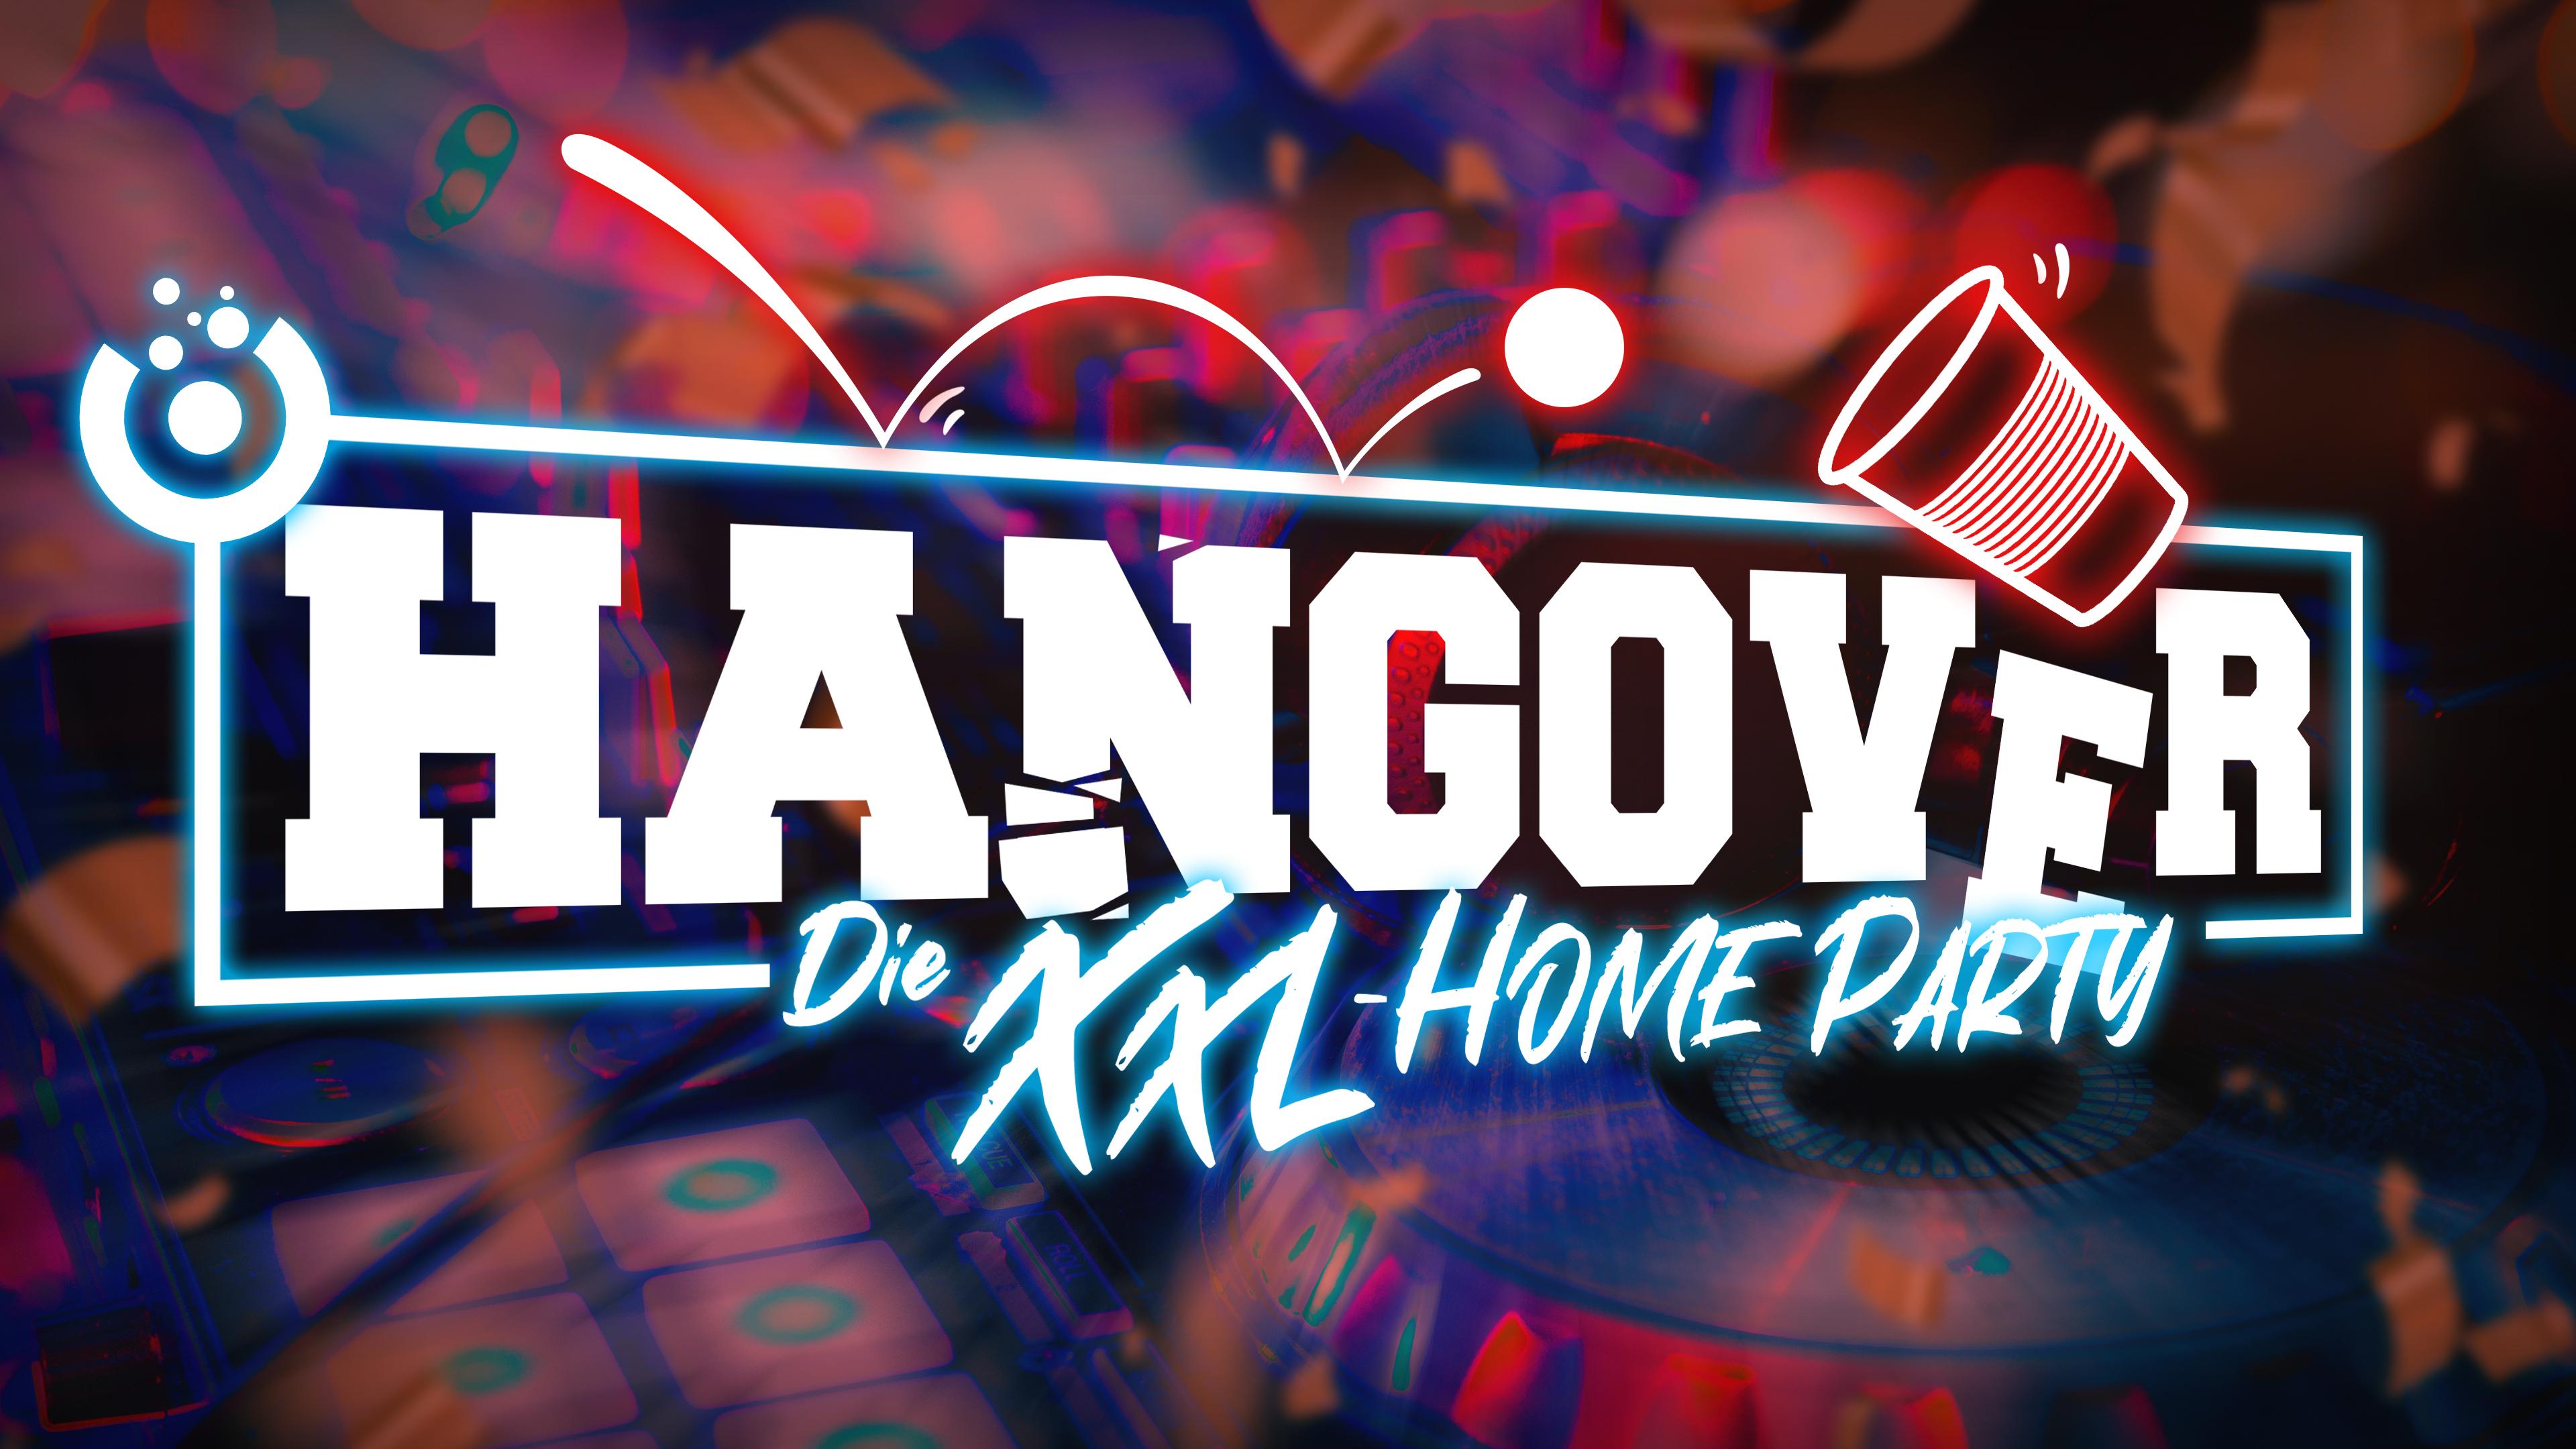 HANGOVER - DIE XXL HOMEPARTY I 20.11.